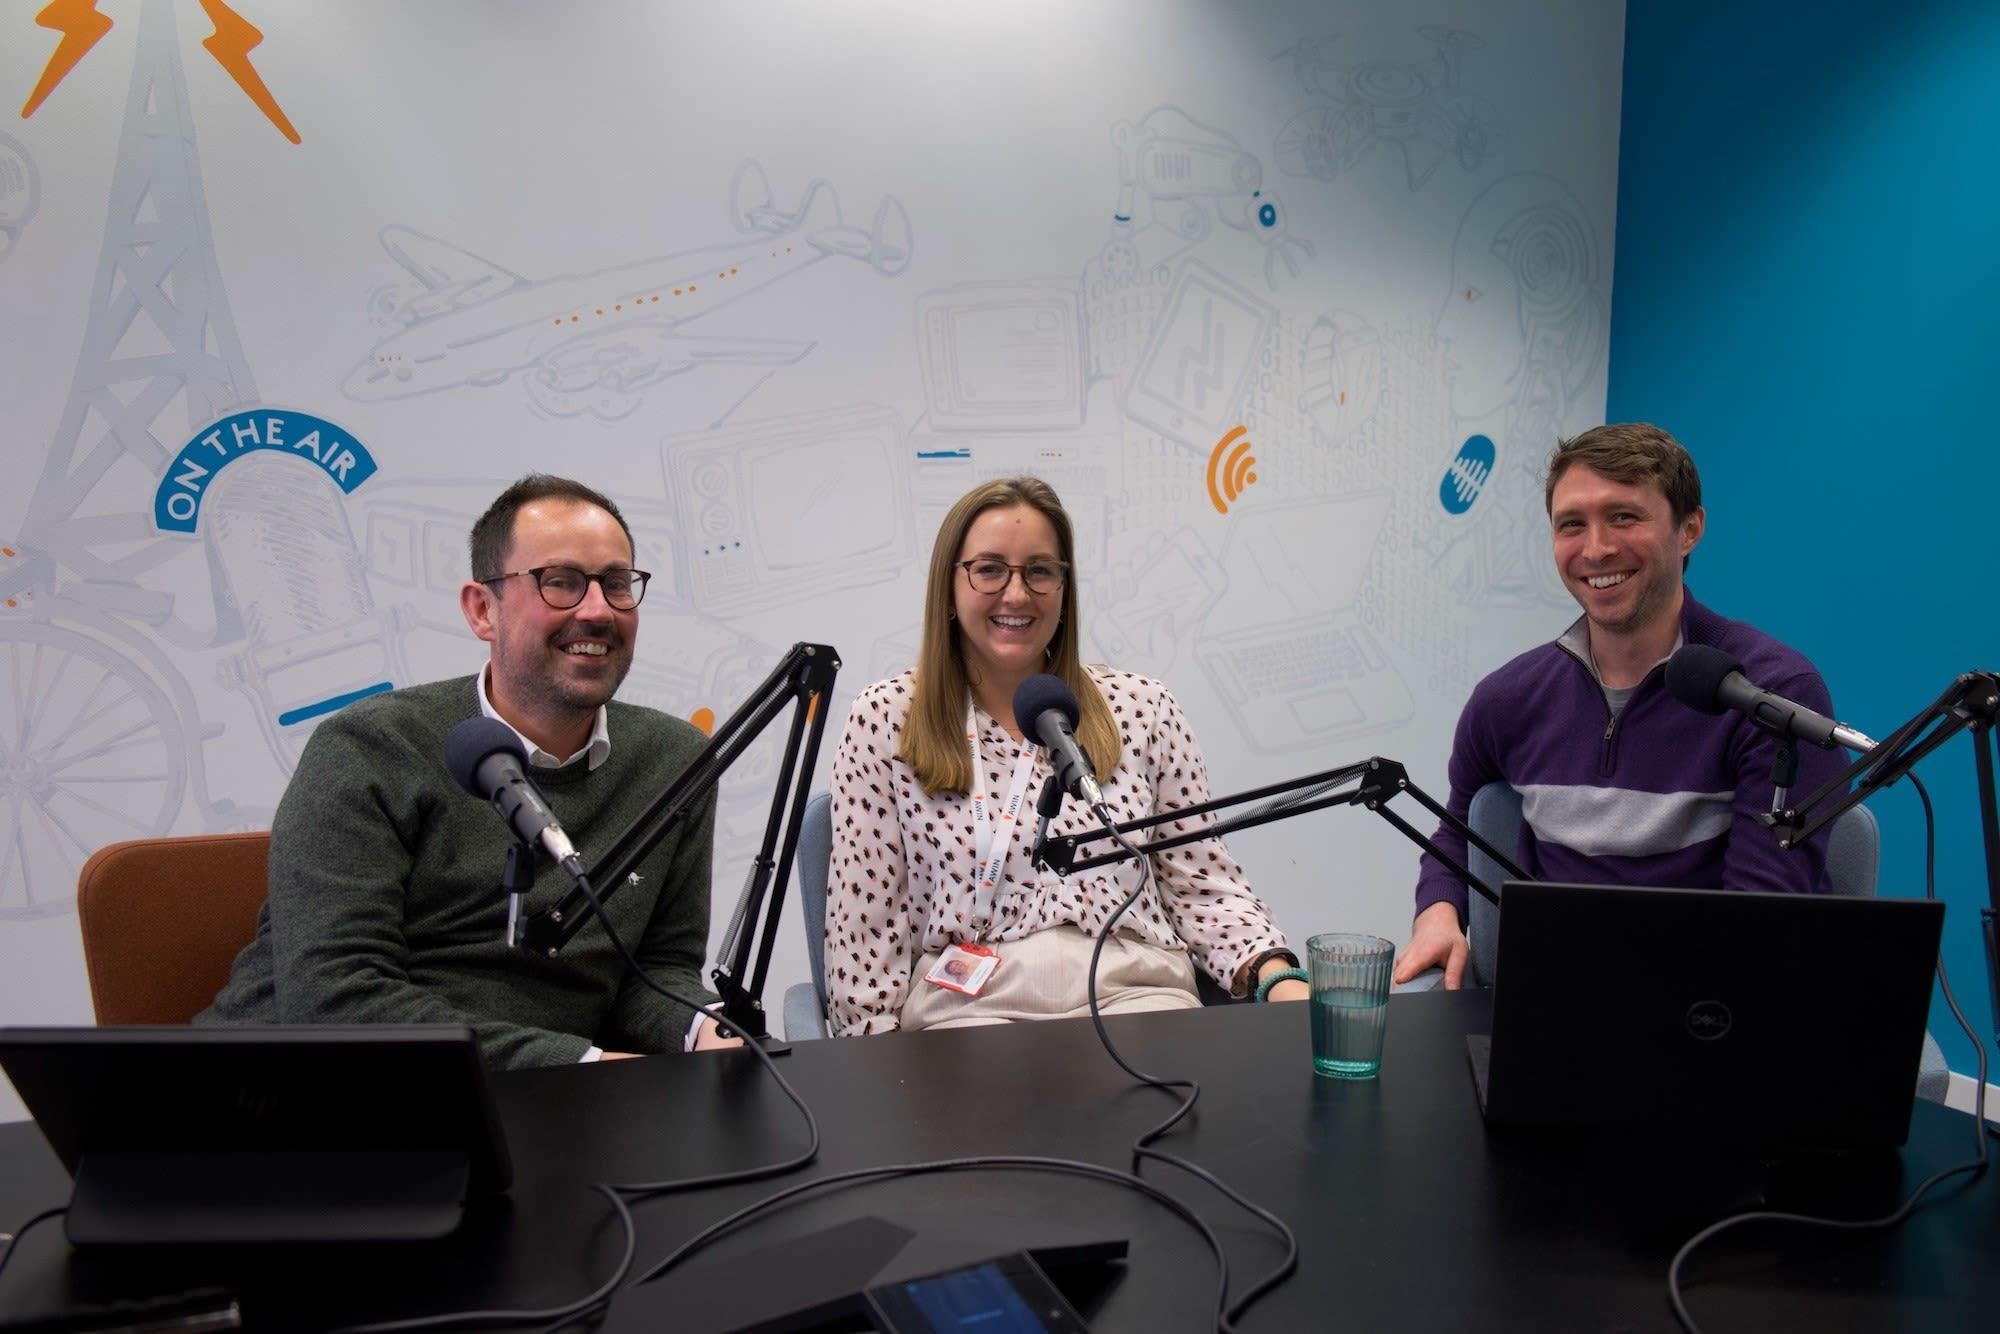 Podcast Awin : Entretiens avec Miya Knights de Eagle Eye Solutions et Chris Johnson de Smarter Click